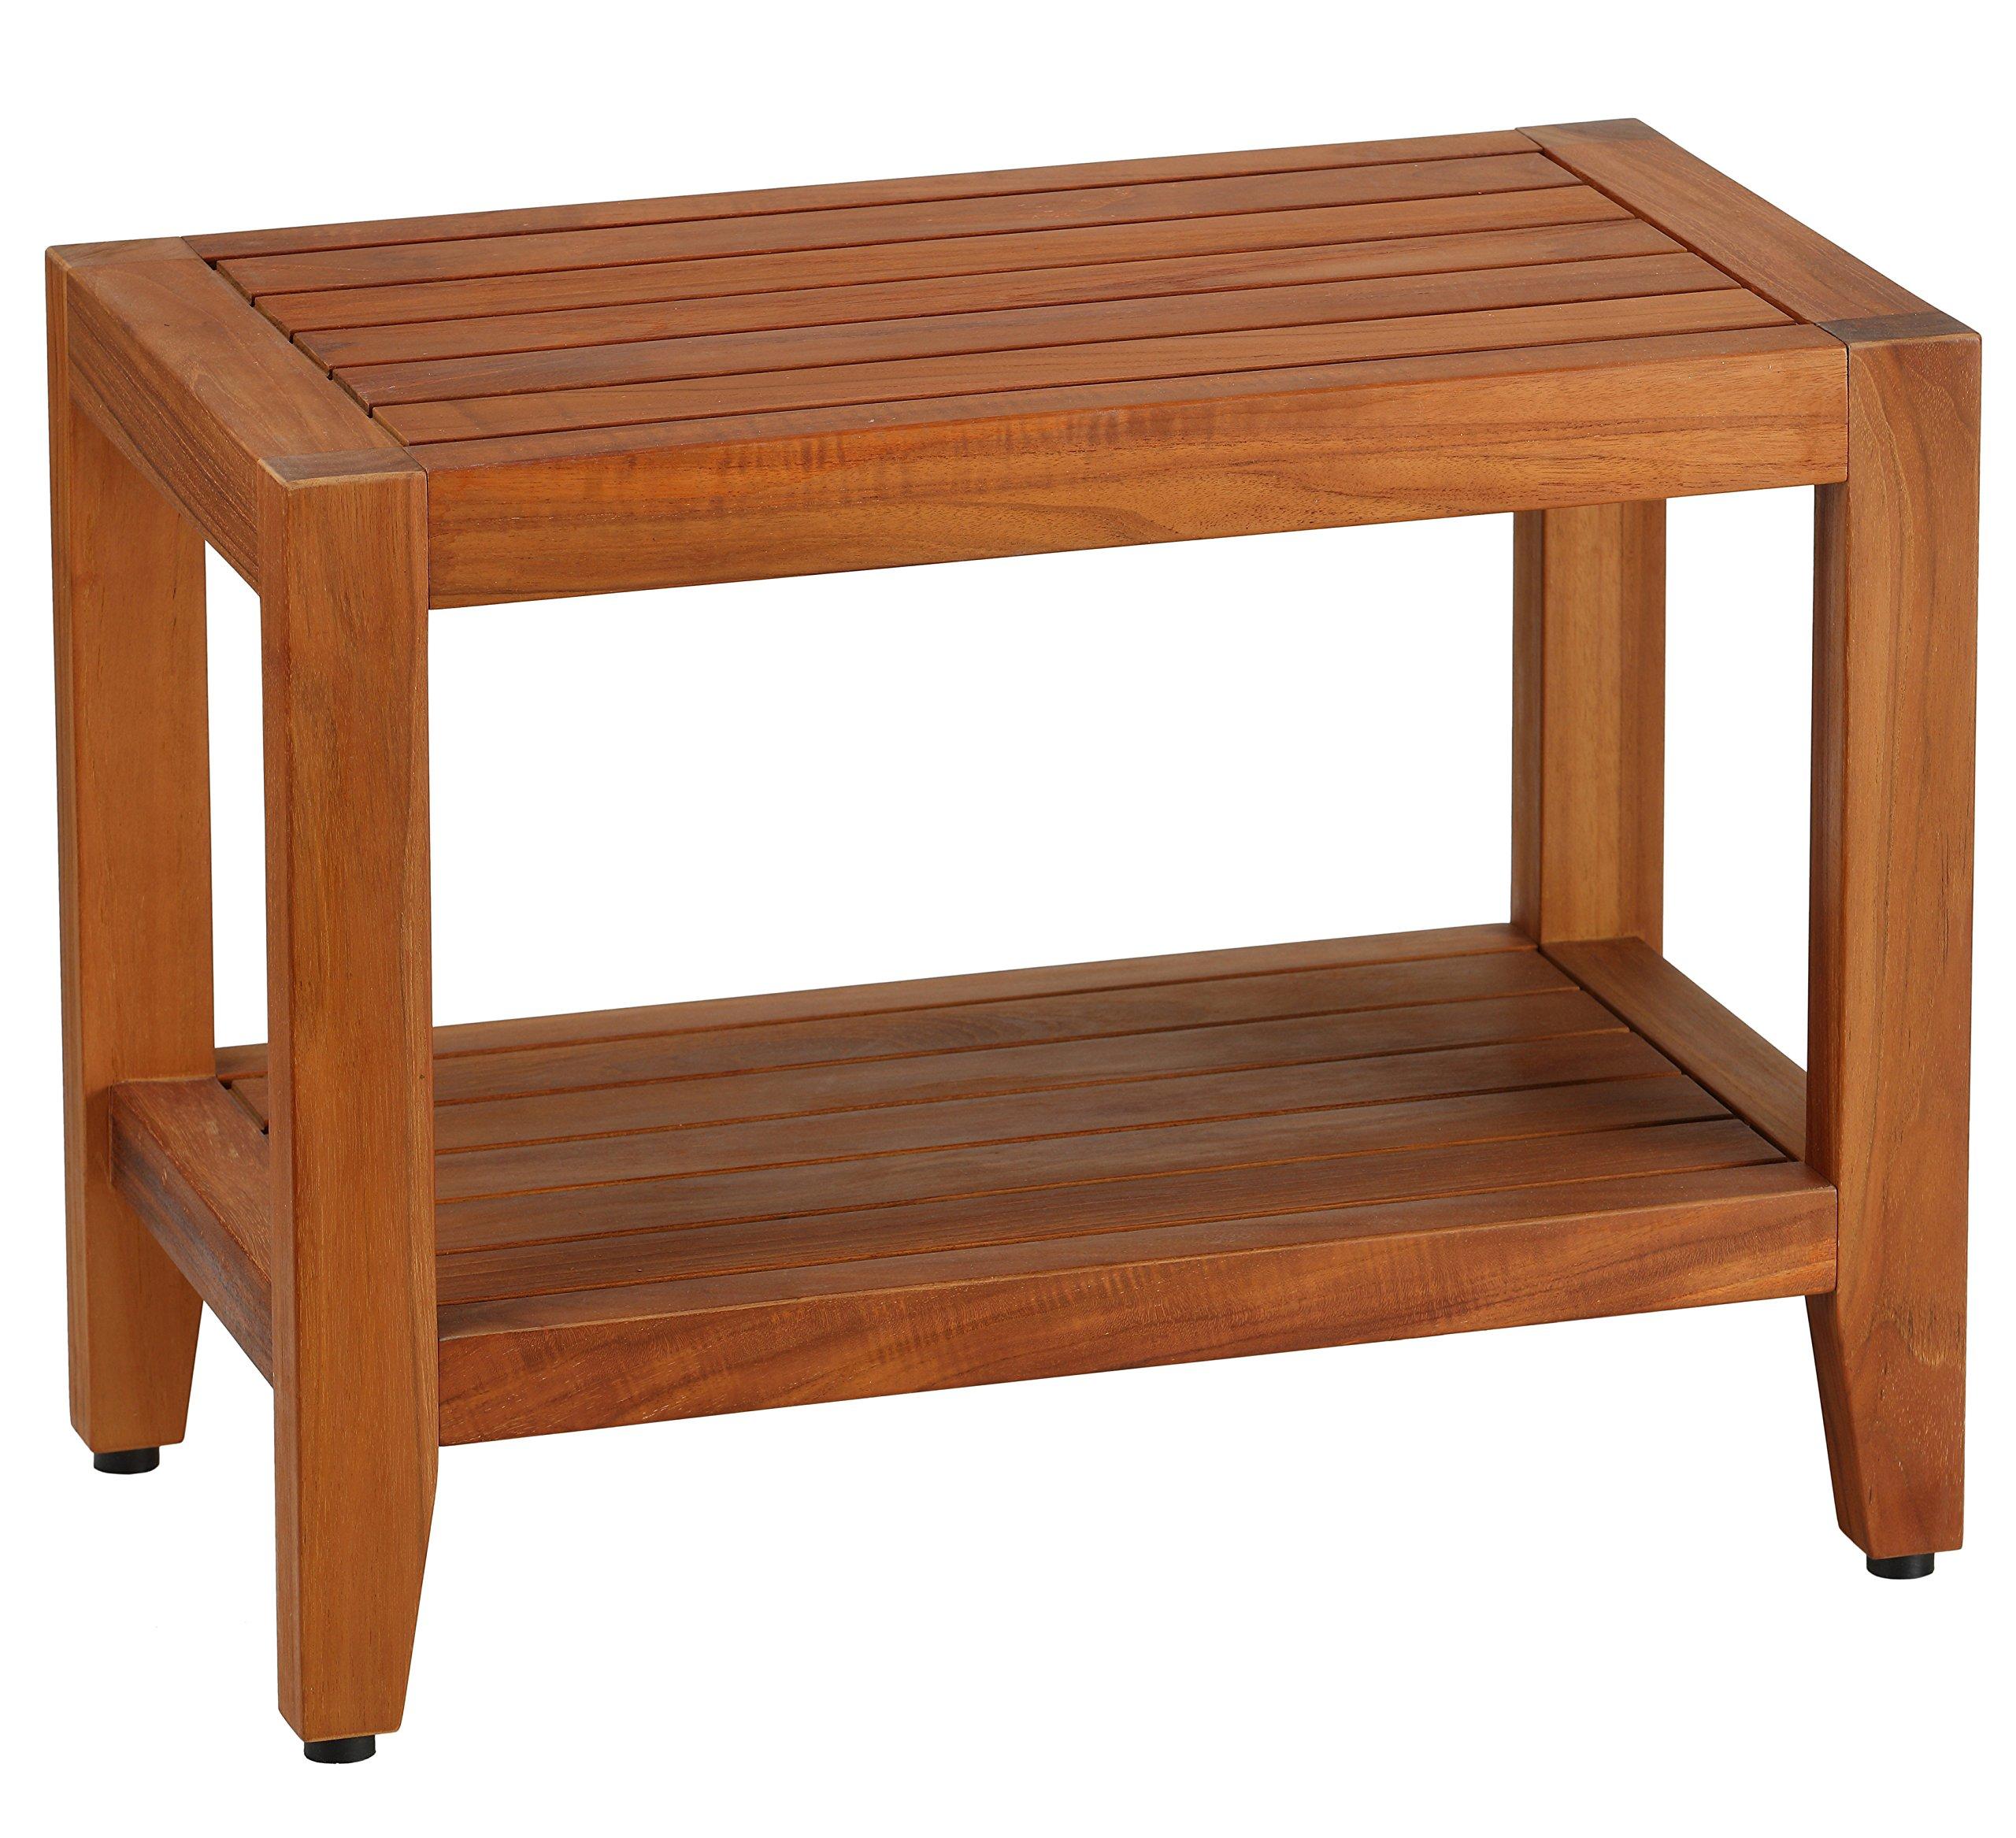 Bare Decor Teak Serenity Spa 24'' Bench with Shelf